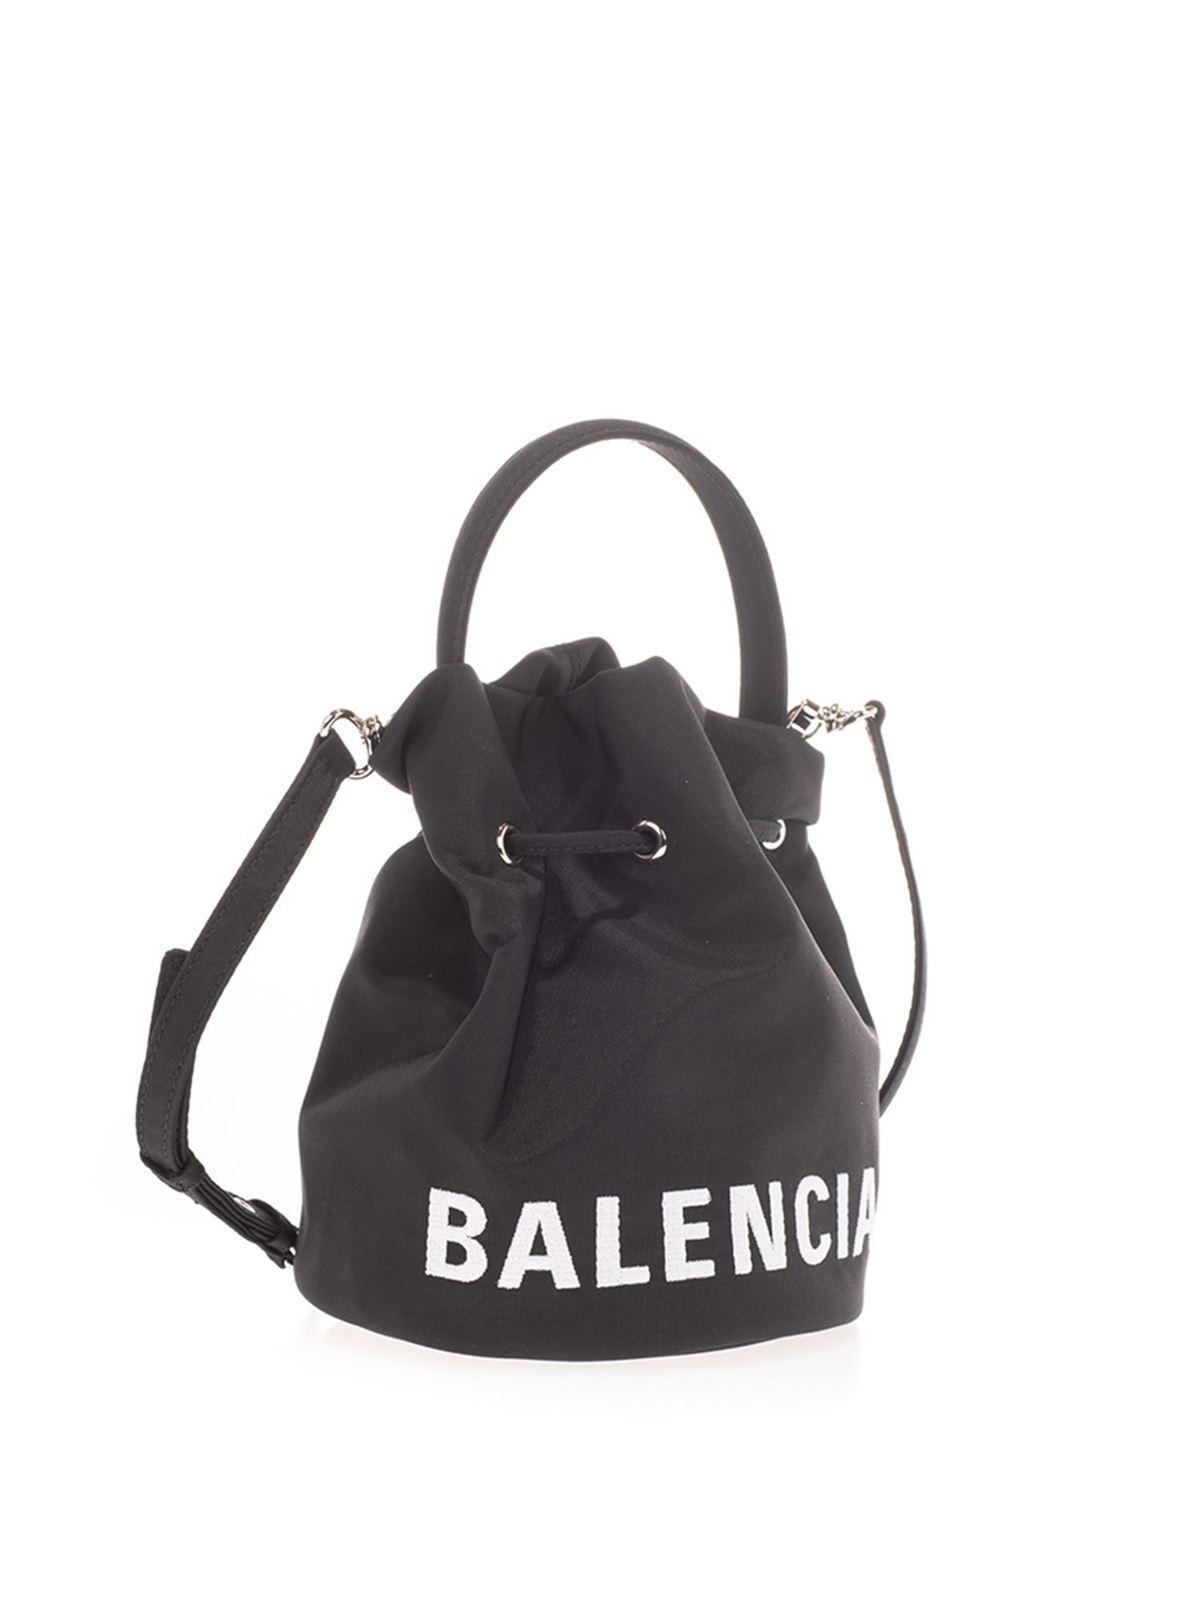 Balenciaga Small Wheel Satchel Bag کیف خمره ای 619458h854n1060